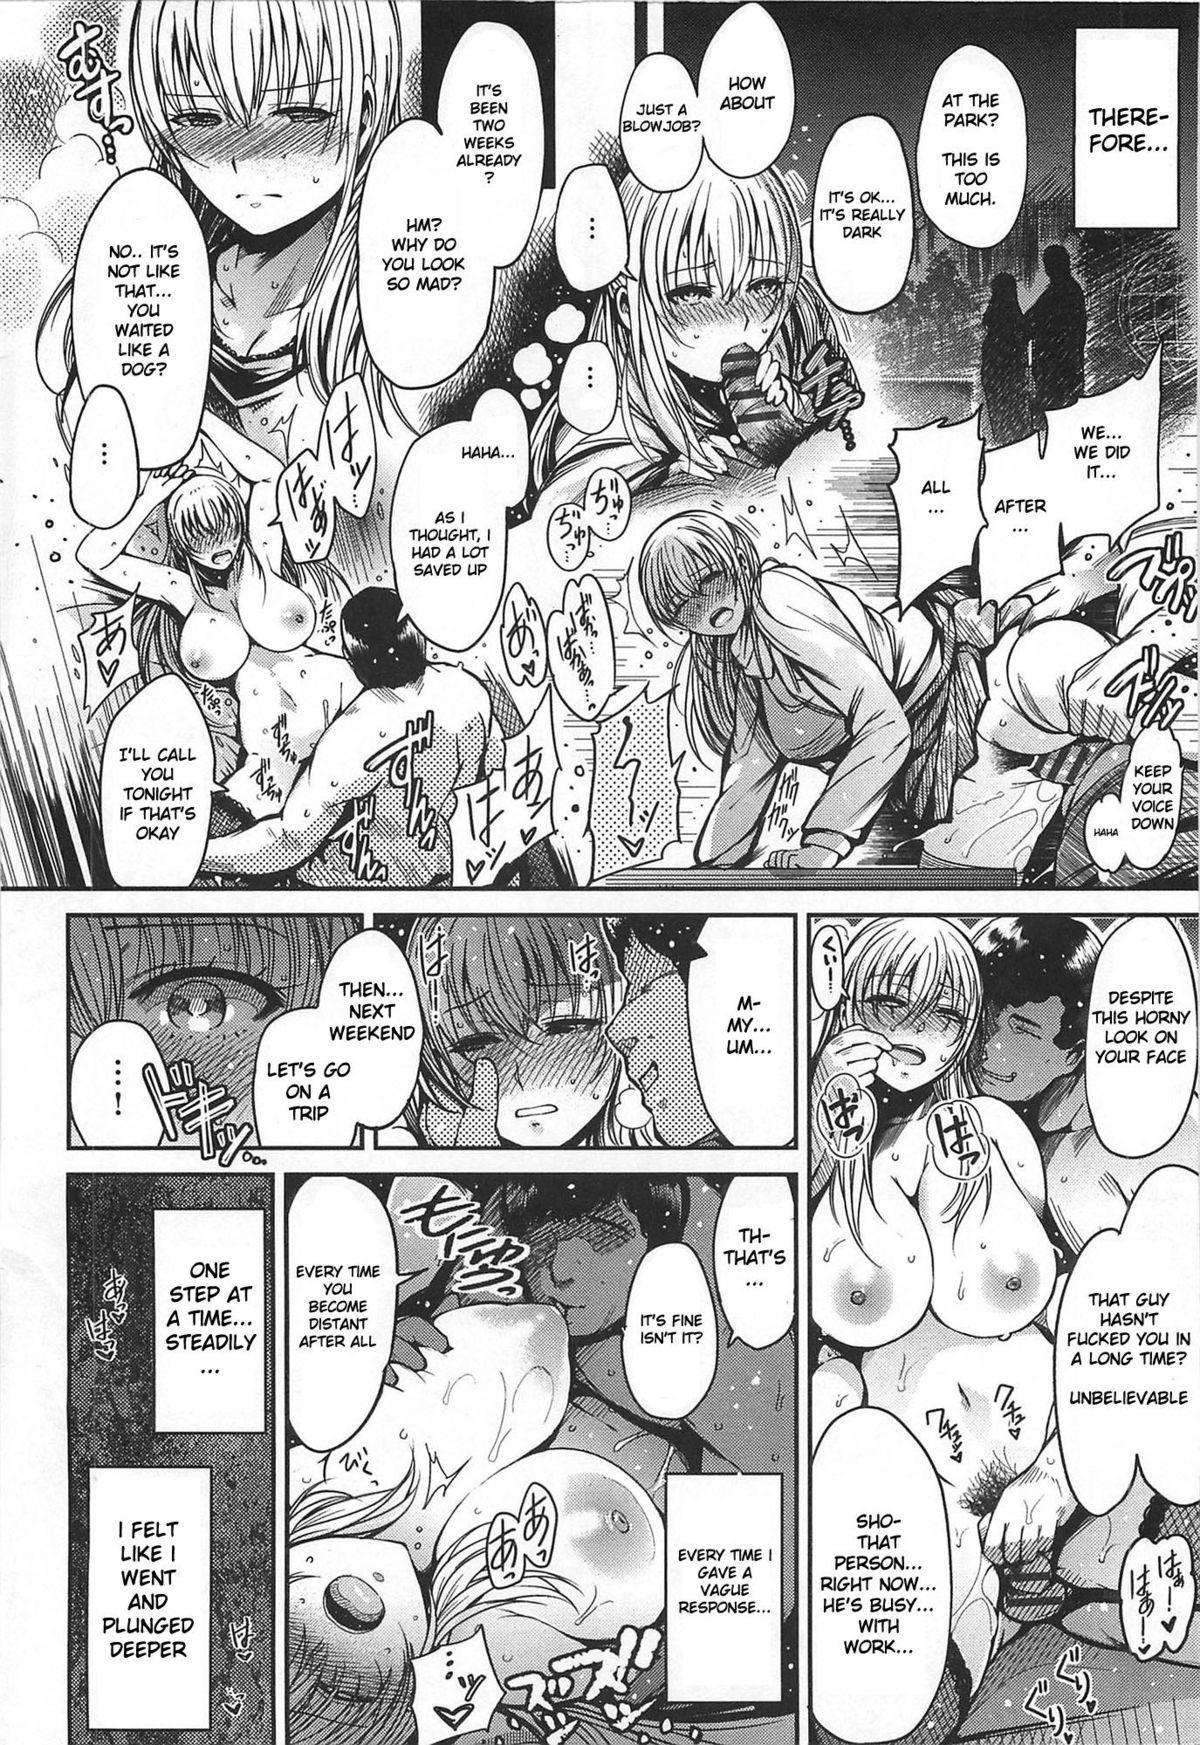 [Ichimatsu] [For my Husband's Sake] 17